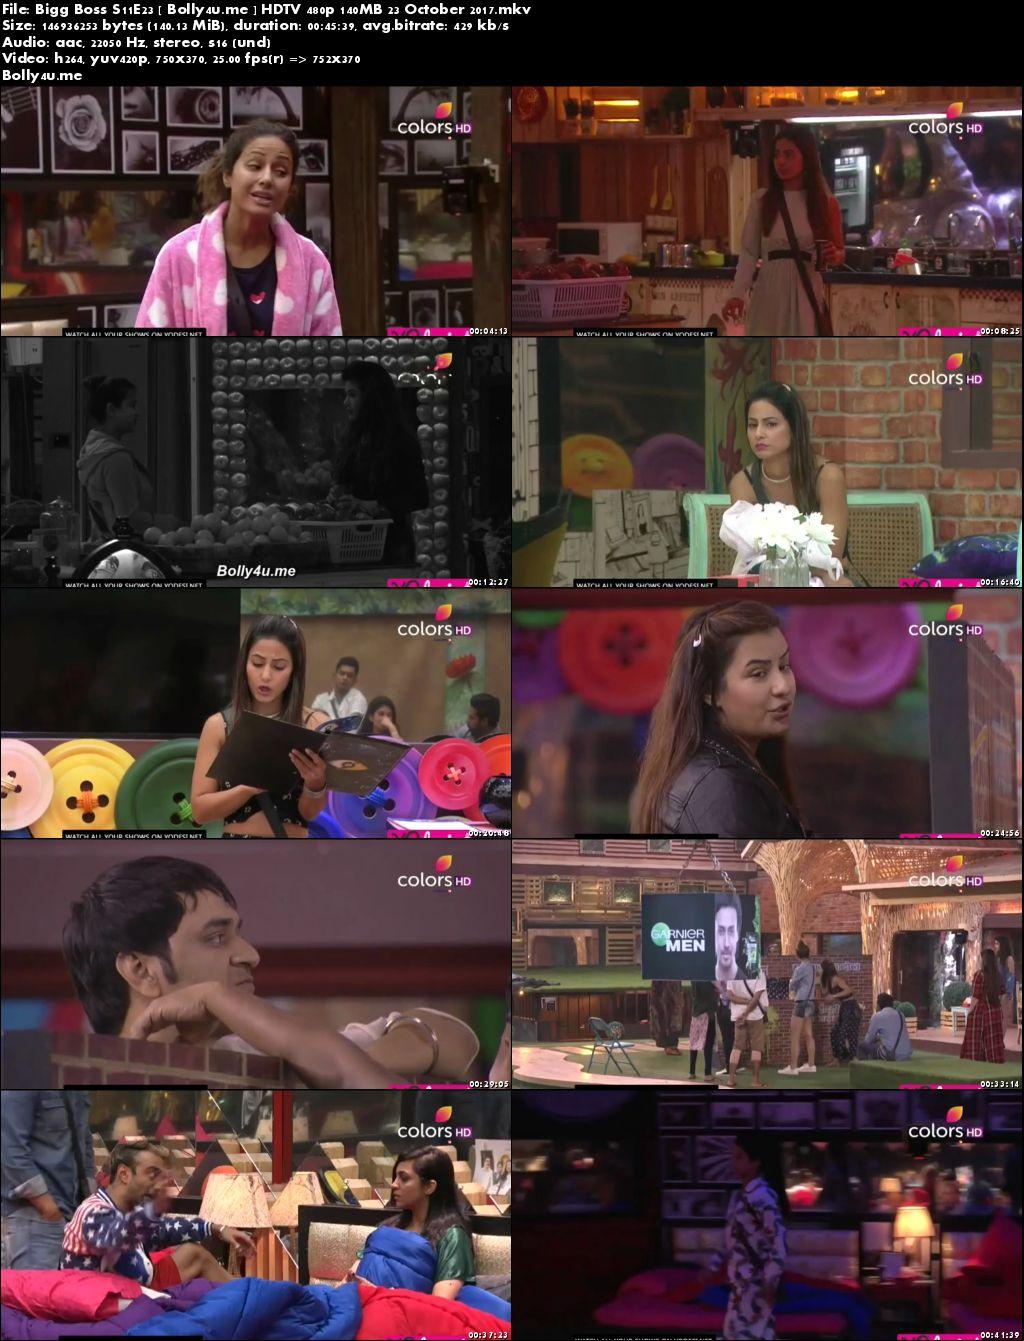 Bigg Boss S11E23 HDTV 480p 140MB 23 Oct 2017 Download